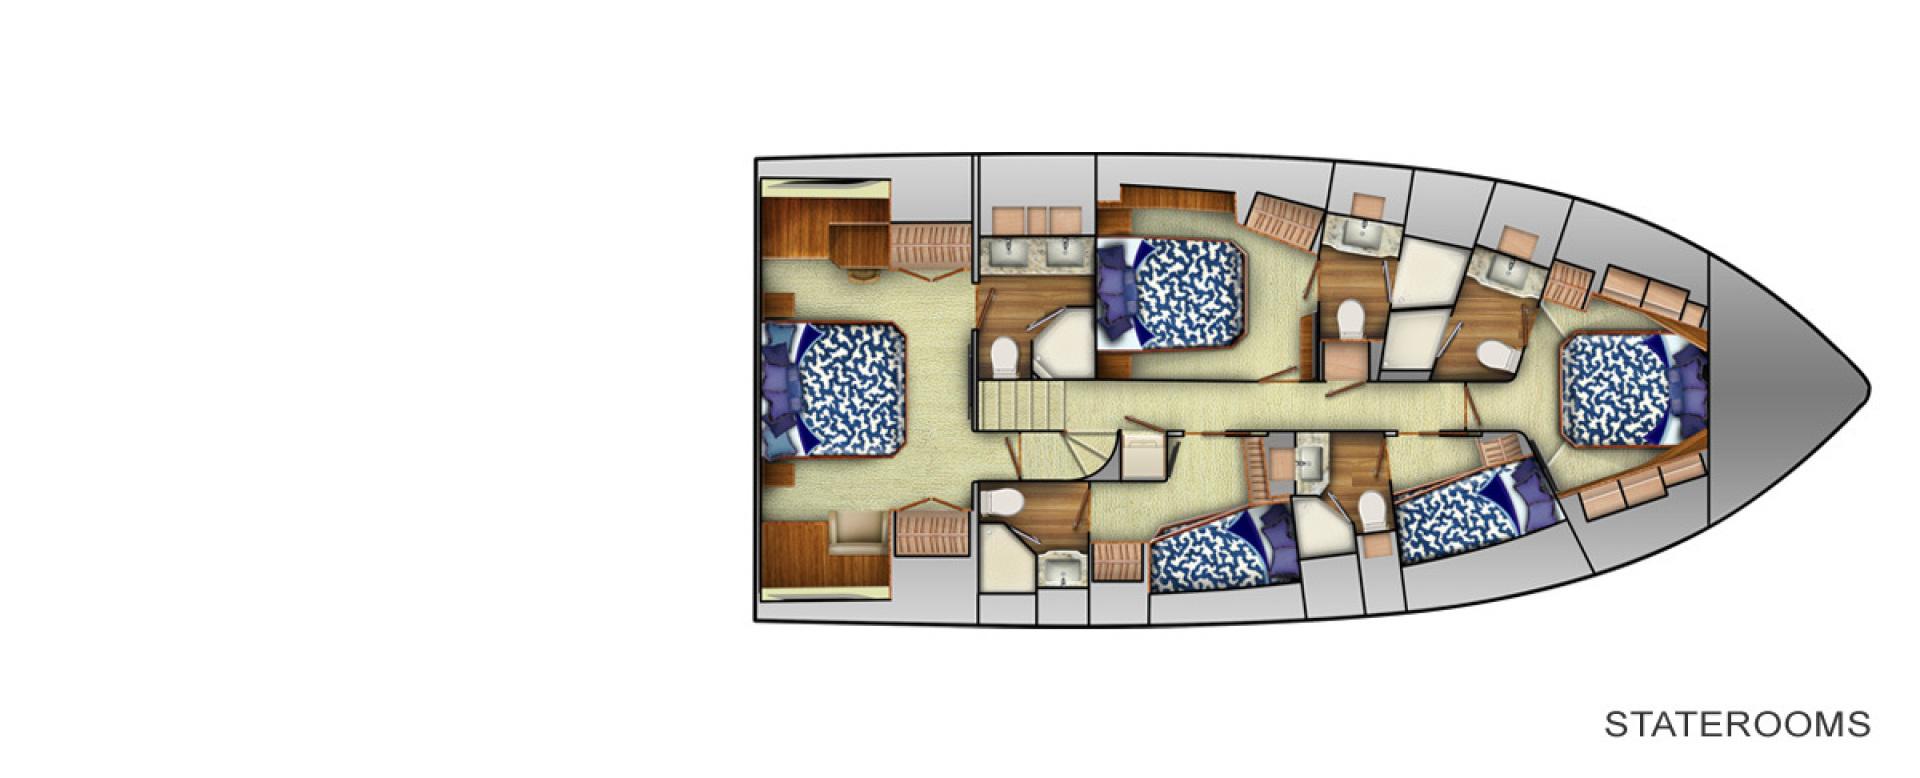 Viking 80 - Stateroom Layout